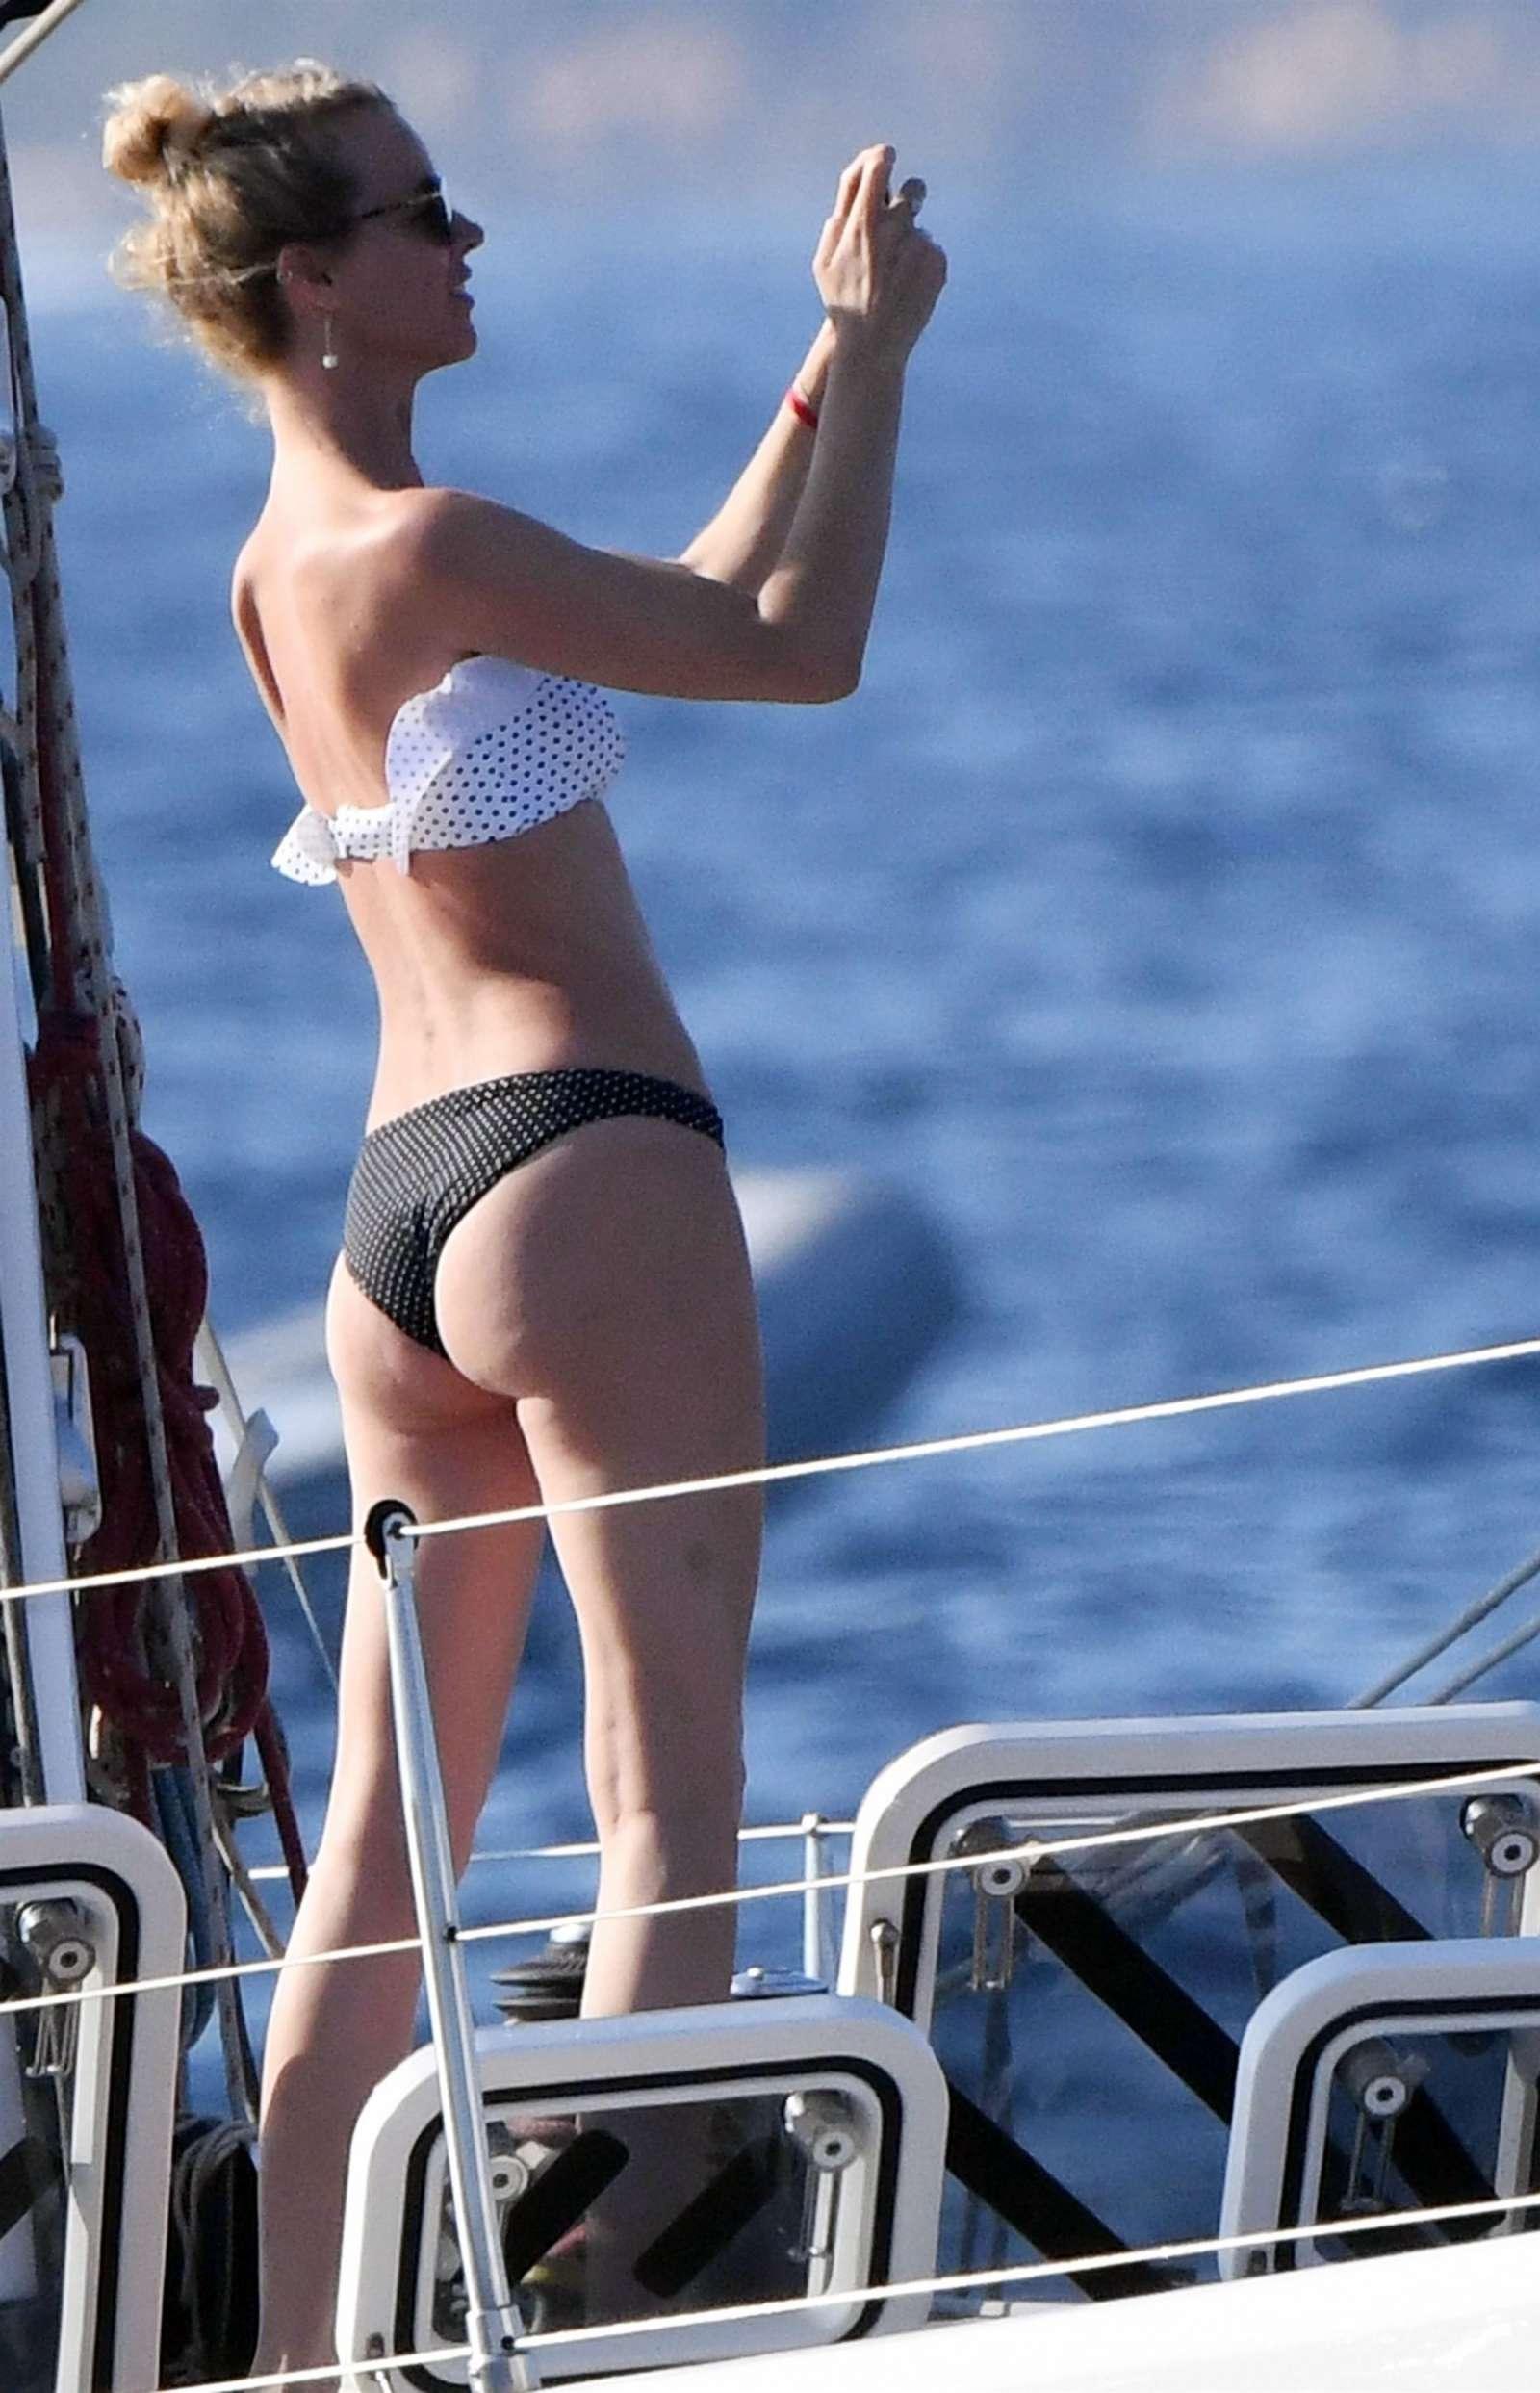 Eva herzigova in bikini porto rotondo italy nudes (18 photo), Instagram Celebrity pics